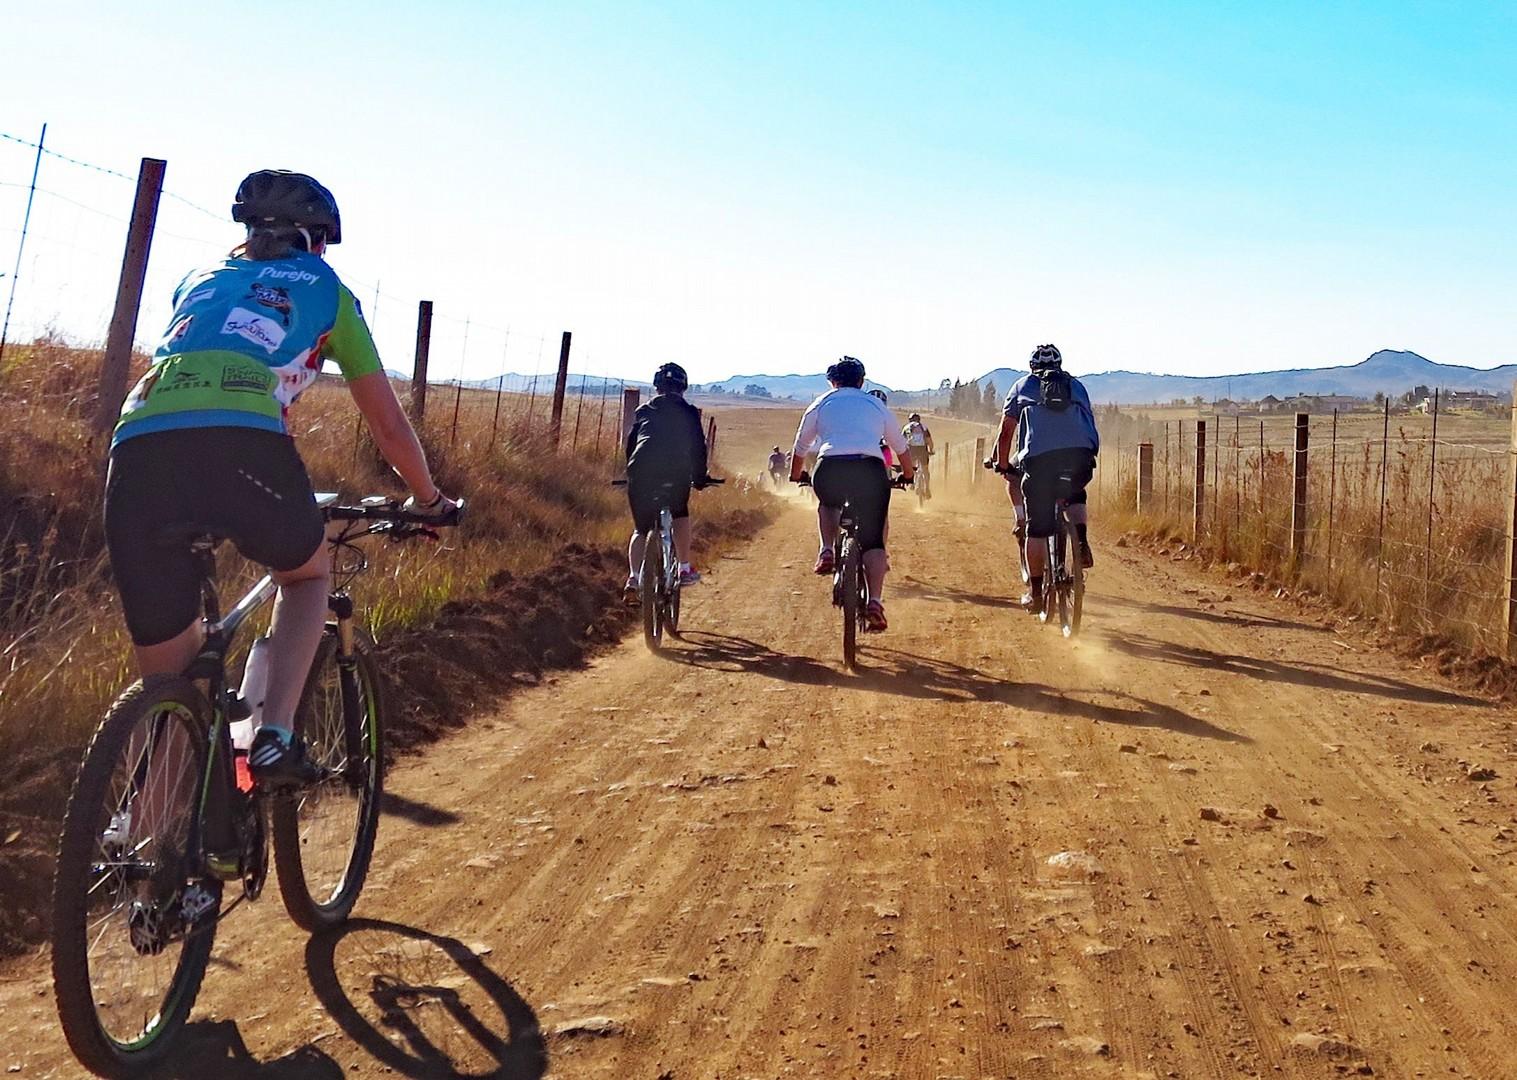 highveld-africa-swaziland-cycling-holiday.jpg - Swaziland (Eswatini) - Cycling Safari - Cycling Adventures